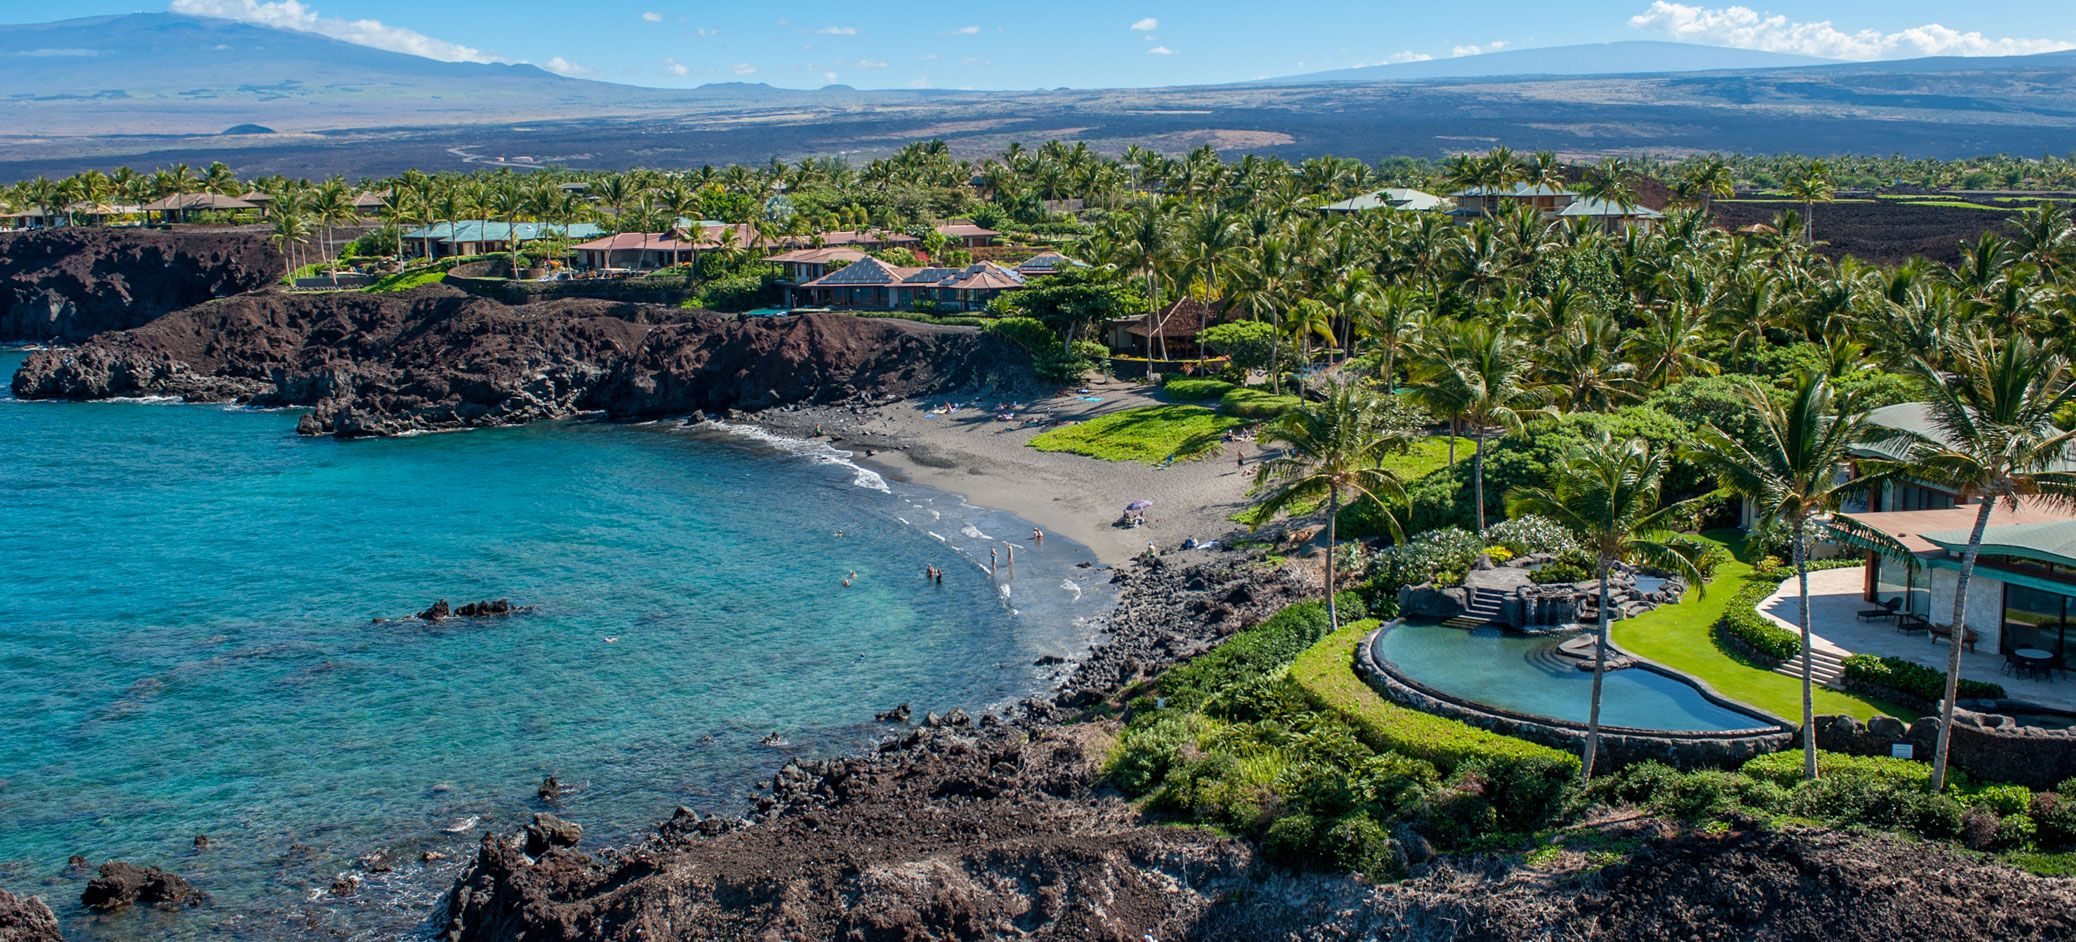 49 Black Sand Beach Hawaii Black Sand Beach Big Island Luxury Big Island Black Sand Beach Black Sand Beach Hawaii Big Island